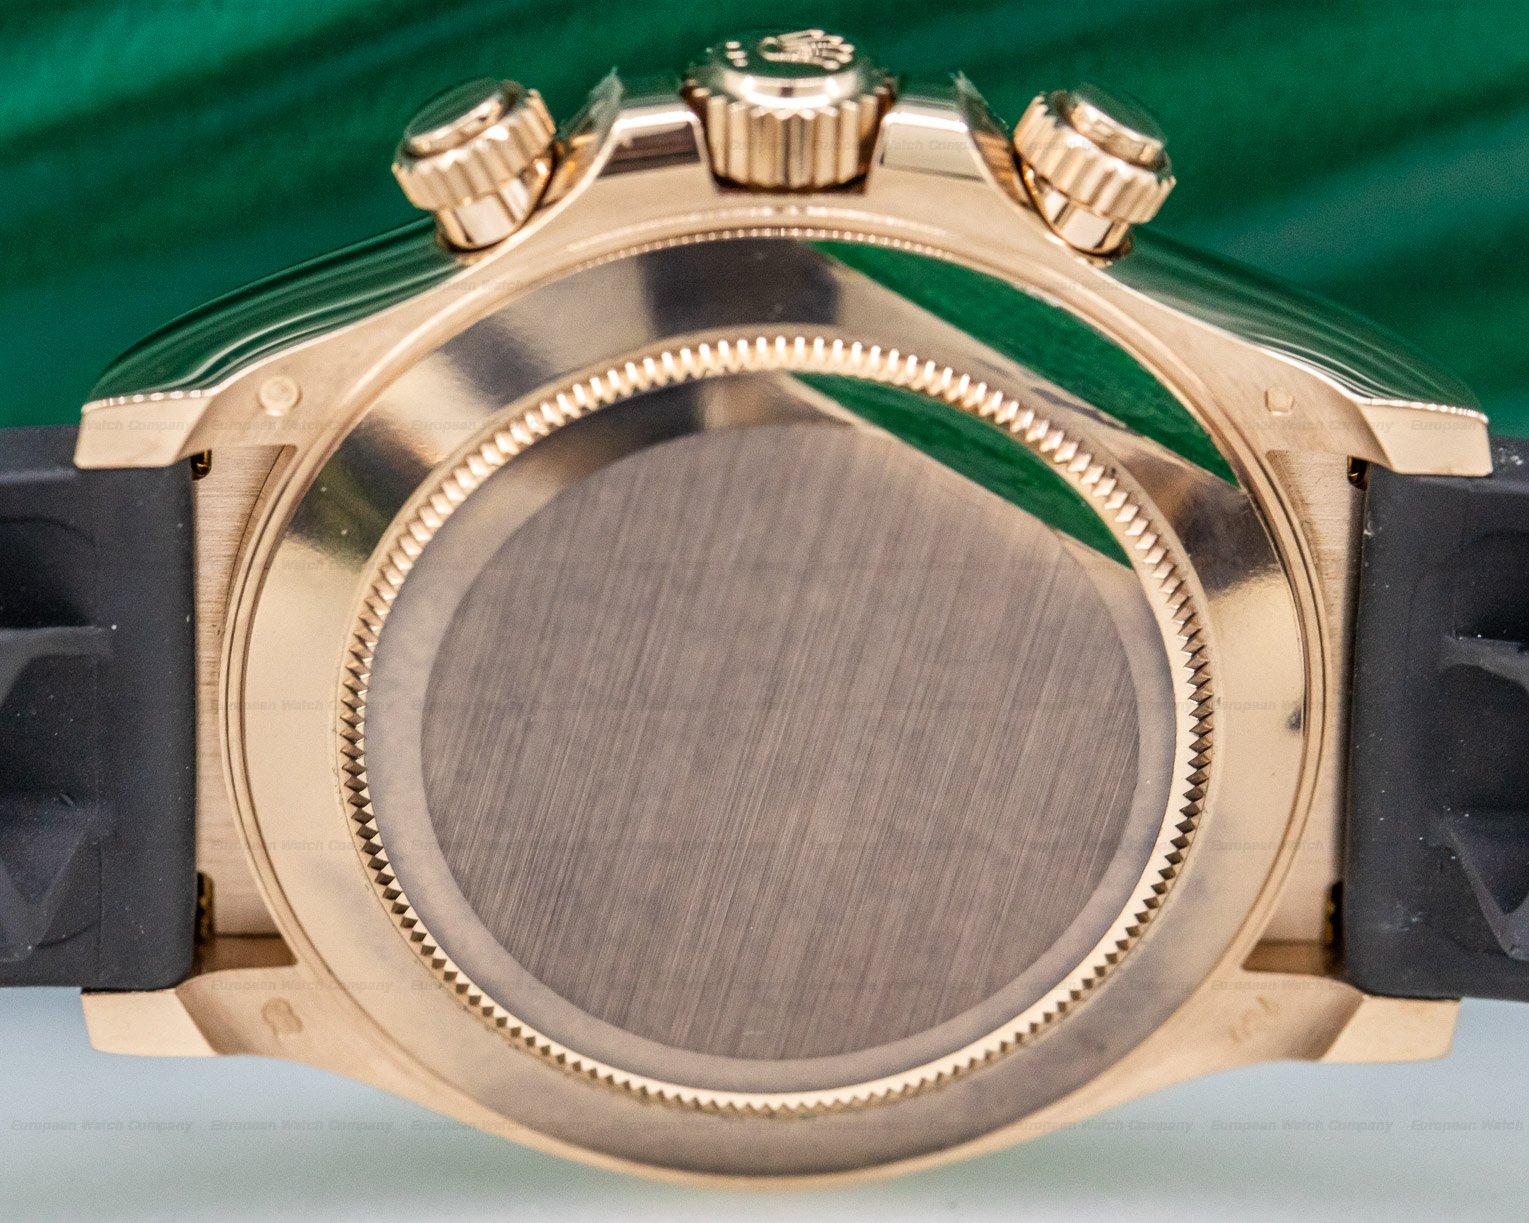 Rolex 116515LN Cosmograph Daytona Ceramic 18K Everose Gold / Rose Dial